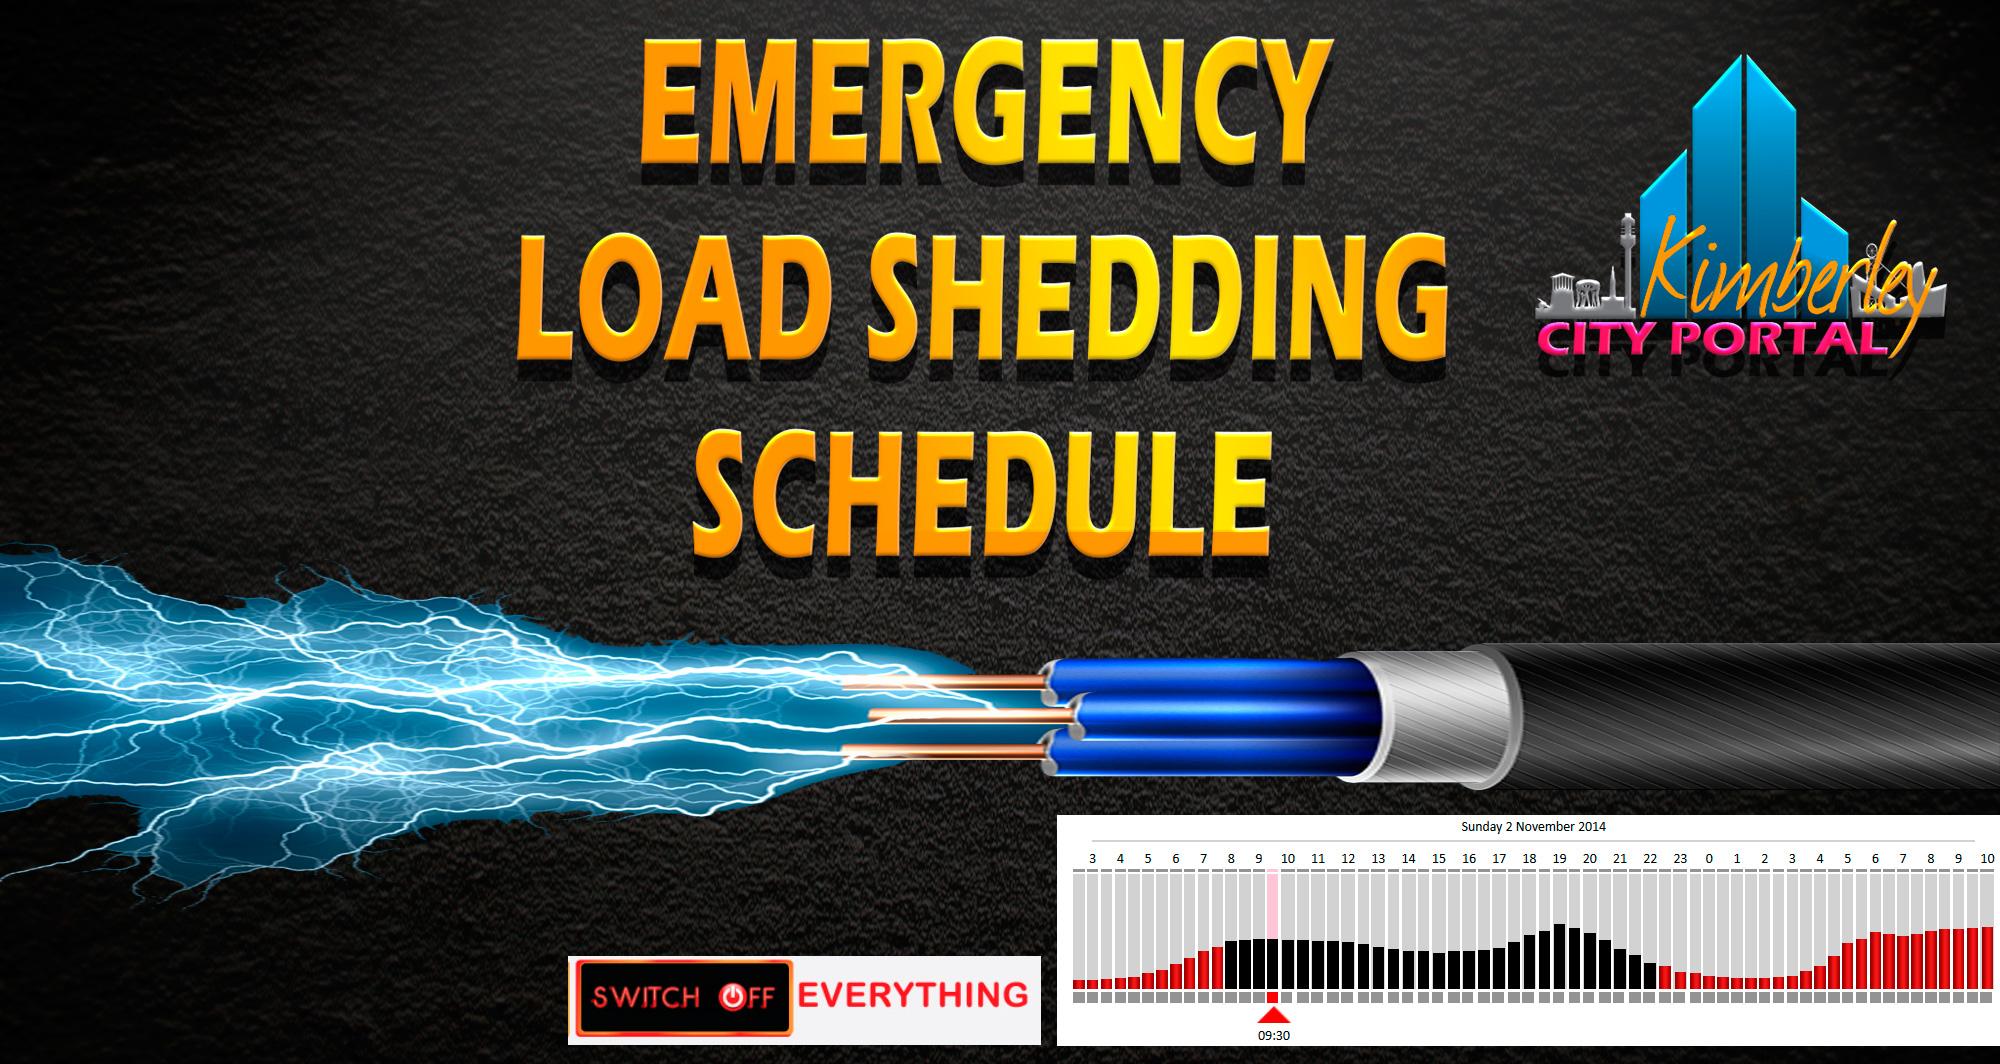 Loadshedding Today: Emergency Load Shedding Schedule 02-11-2014